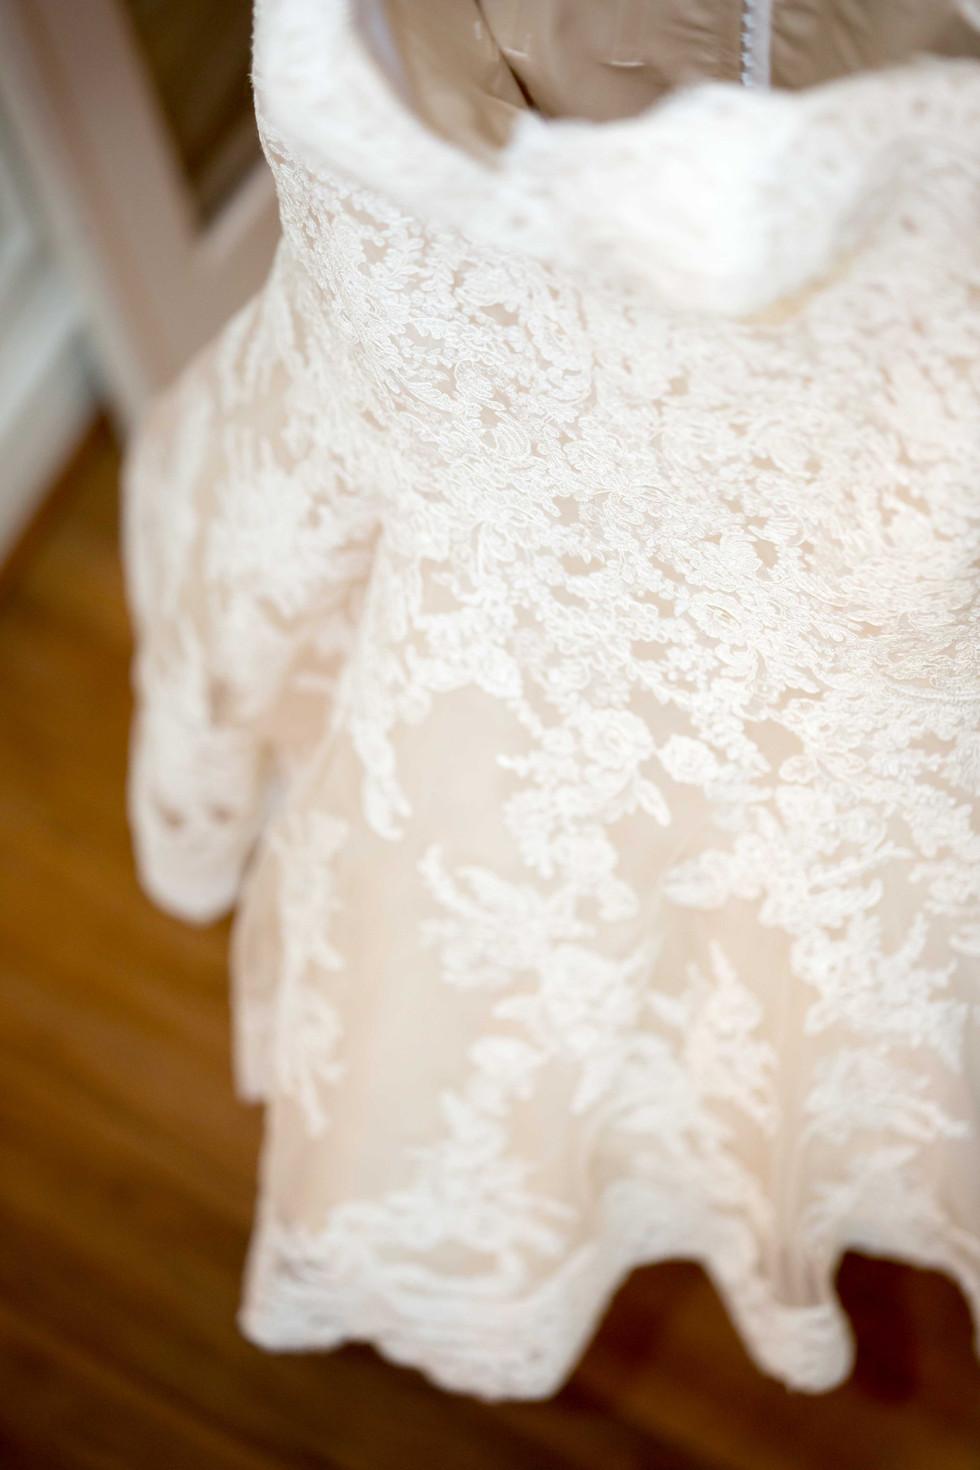 Bride's dress hanging